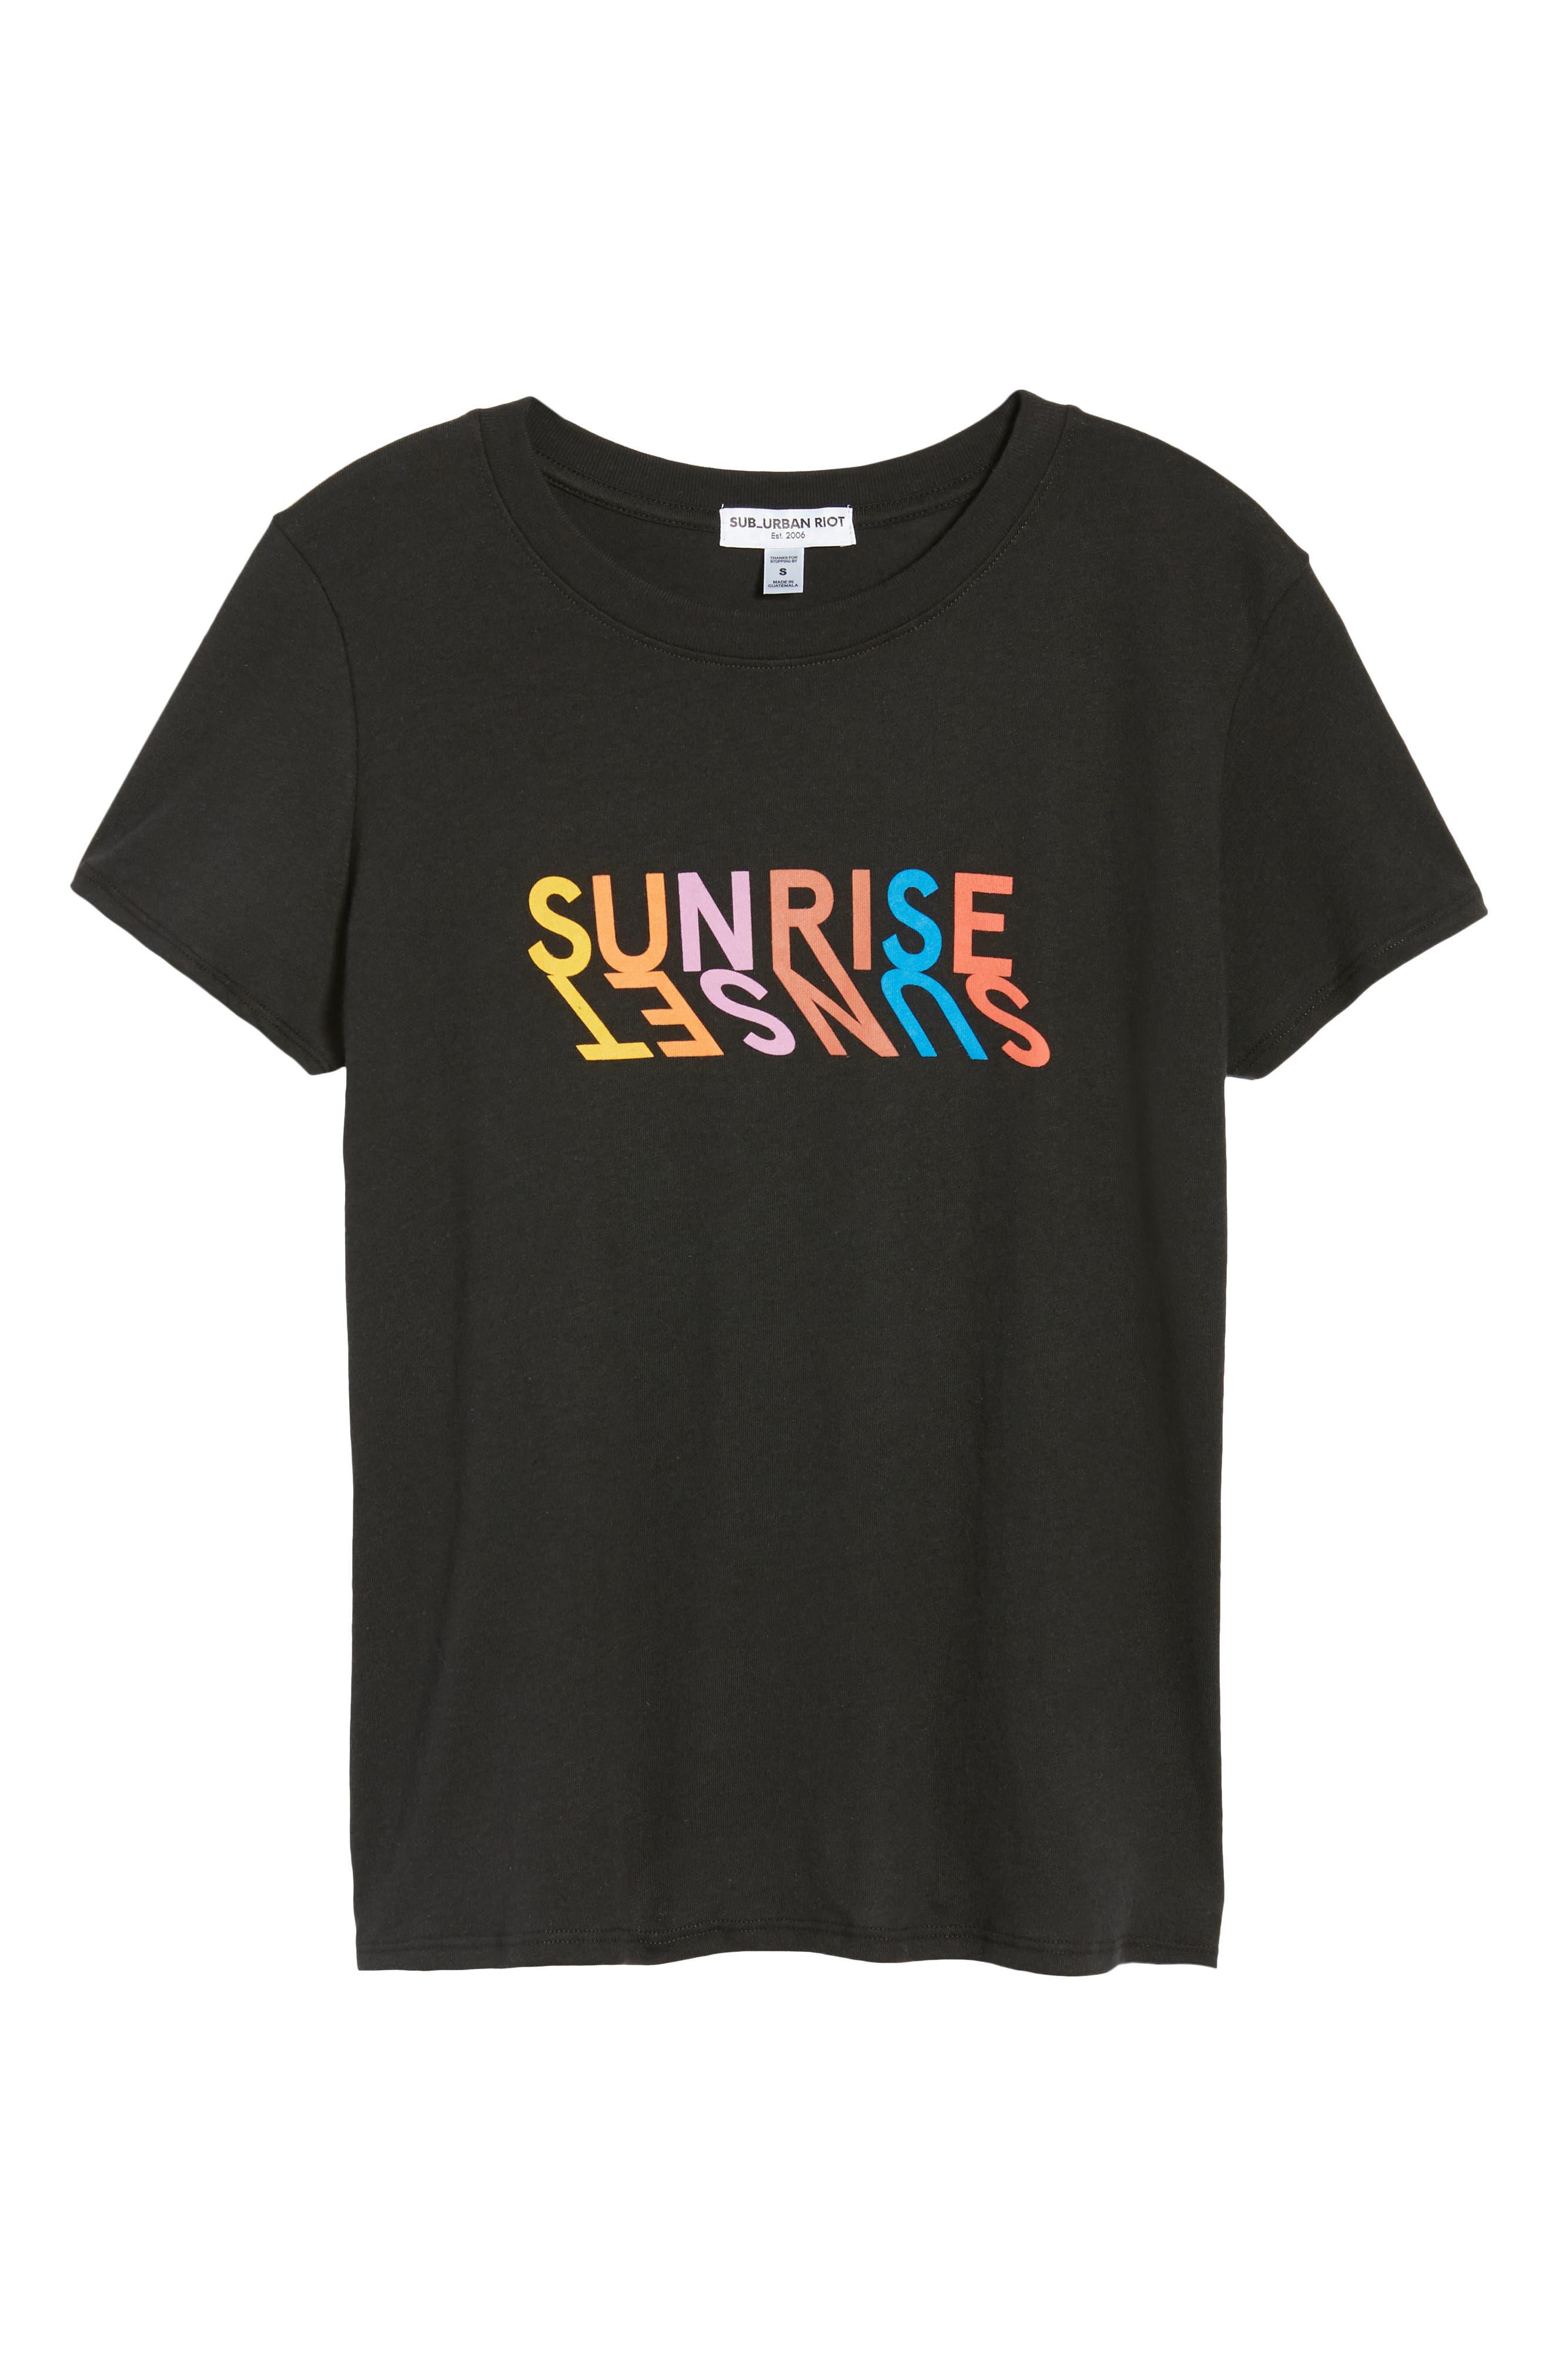 Sunrise Sunset Slouched Tee,                             Alternate thumbnail 6, color,                             Black